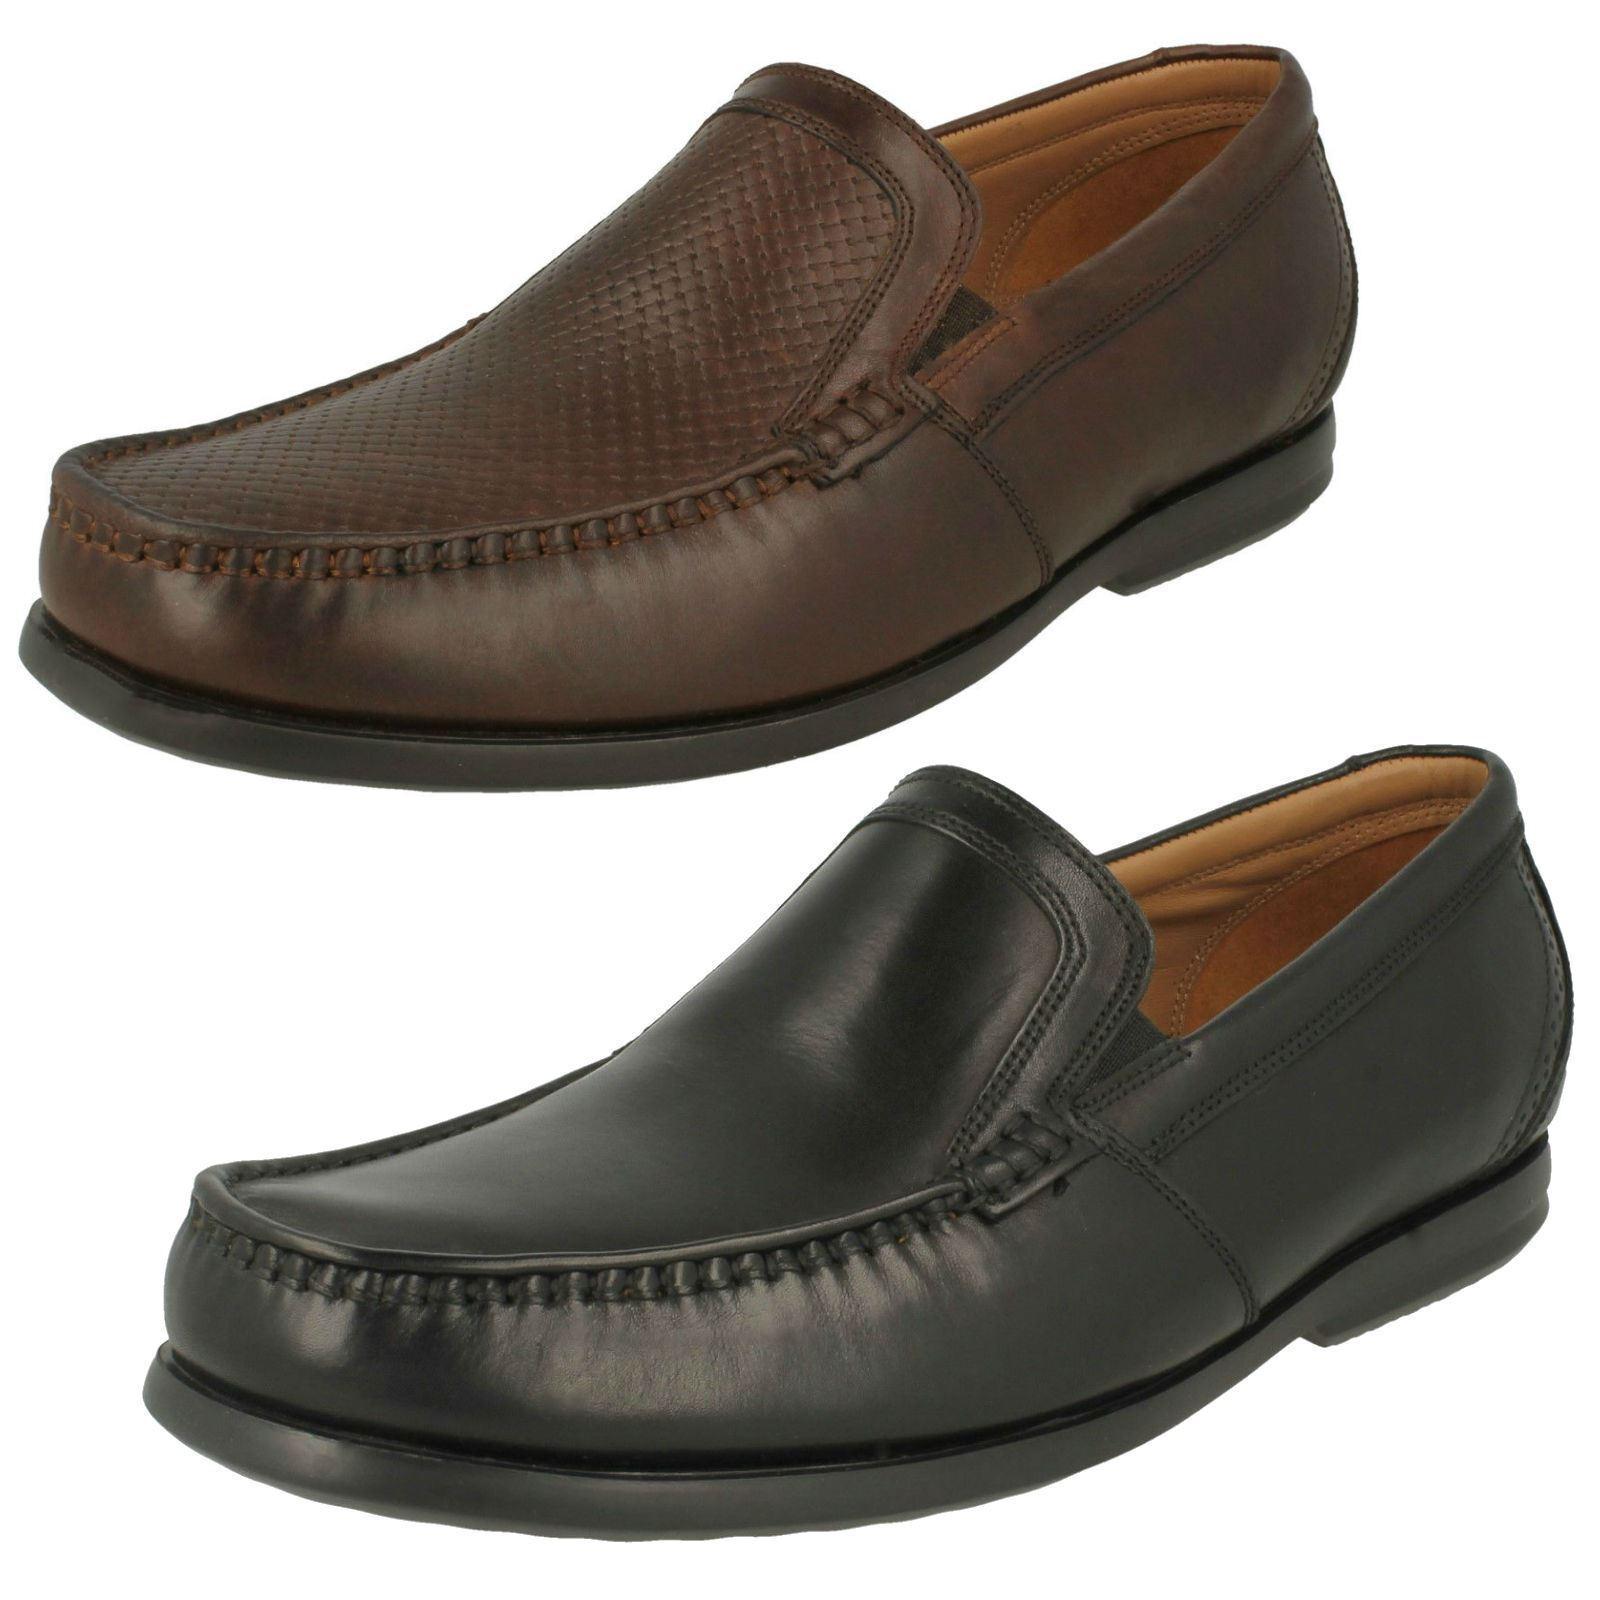 Clarks Gala Uomo Slip-On, Loafers' un Gala Clarks Gratis' 754e26